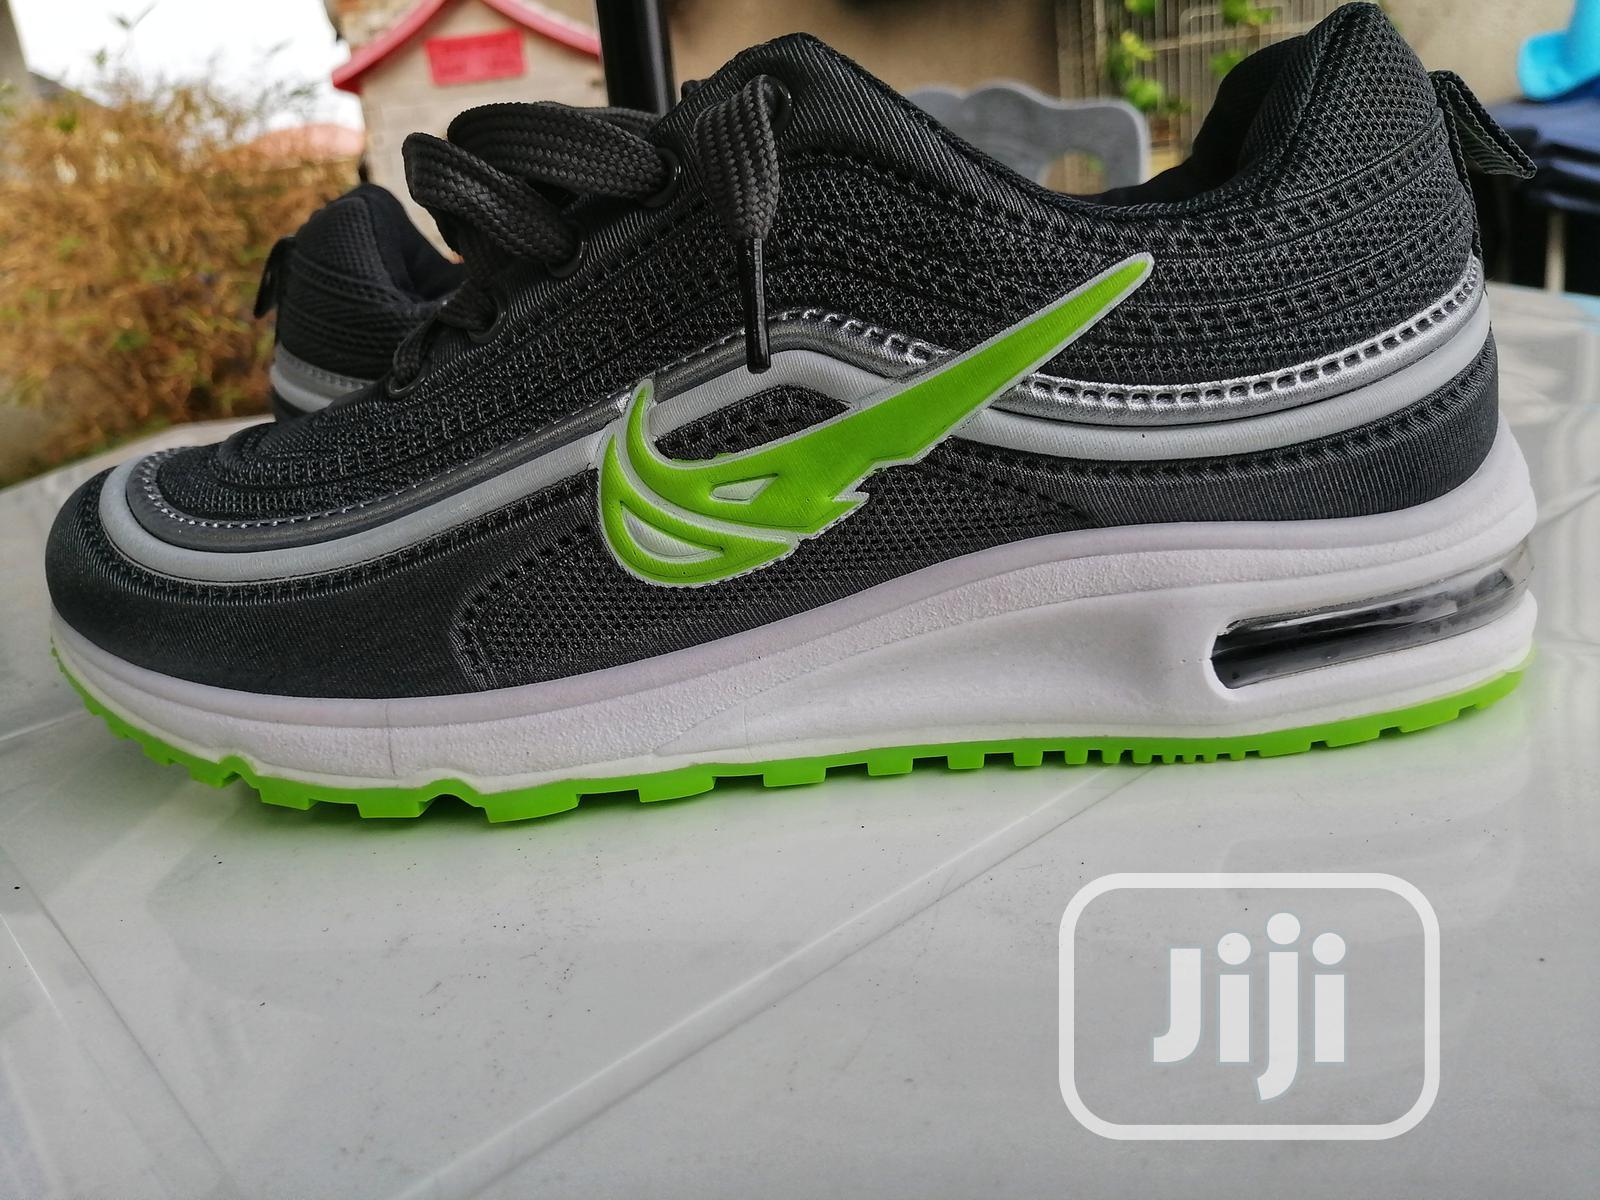 Male Unisex Fashion Sneakers